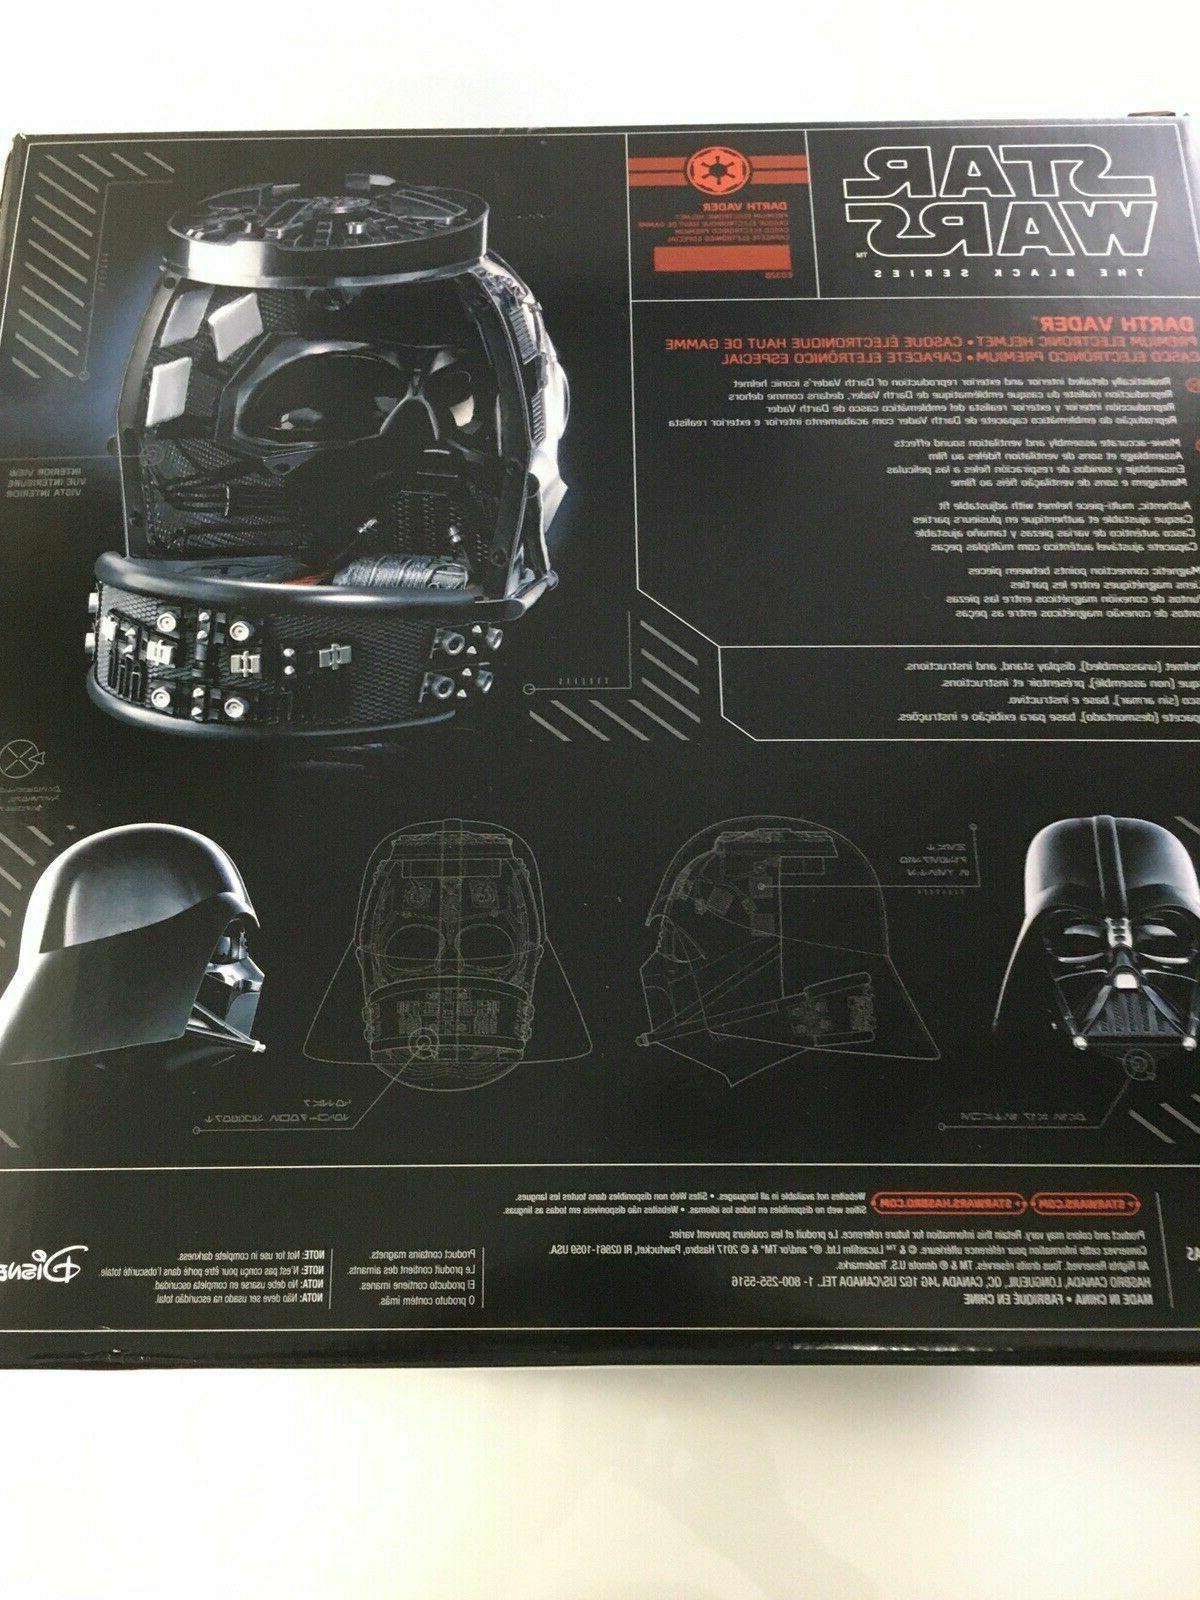 HASBRO Black Darth Vader Premium Electronic